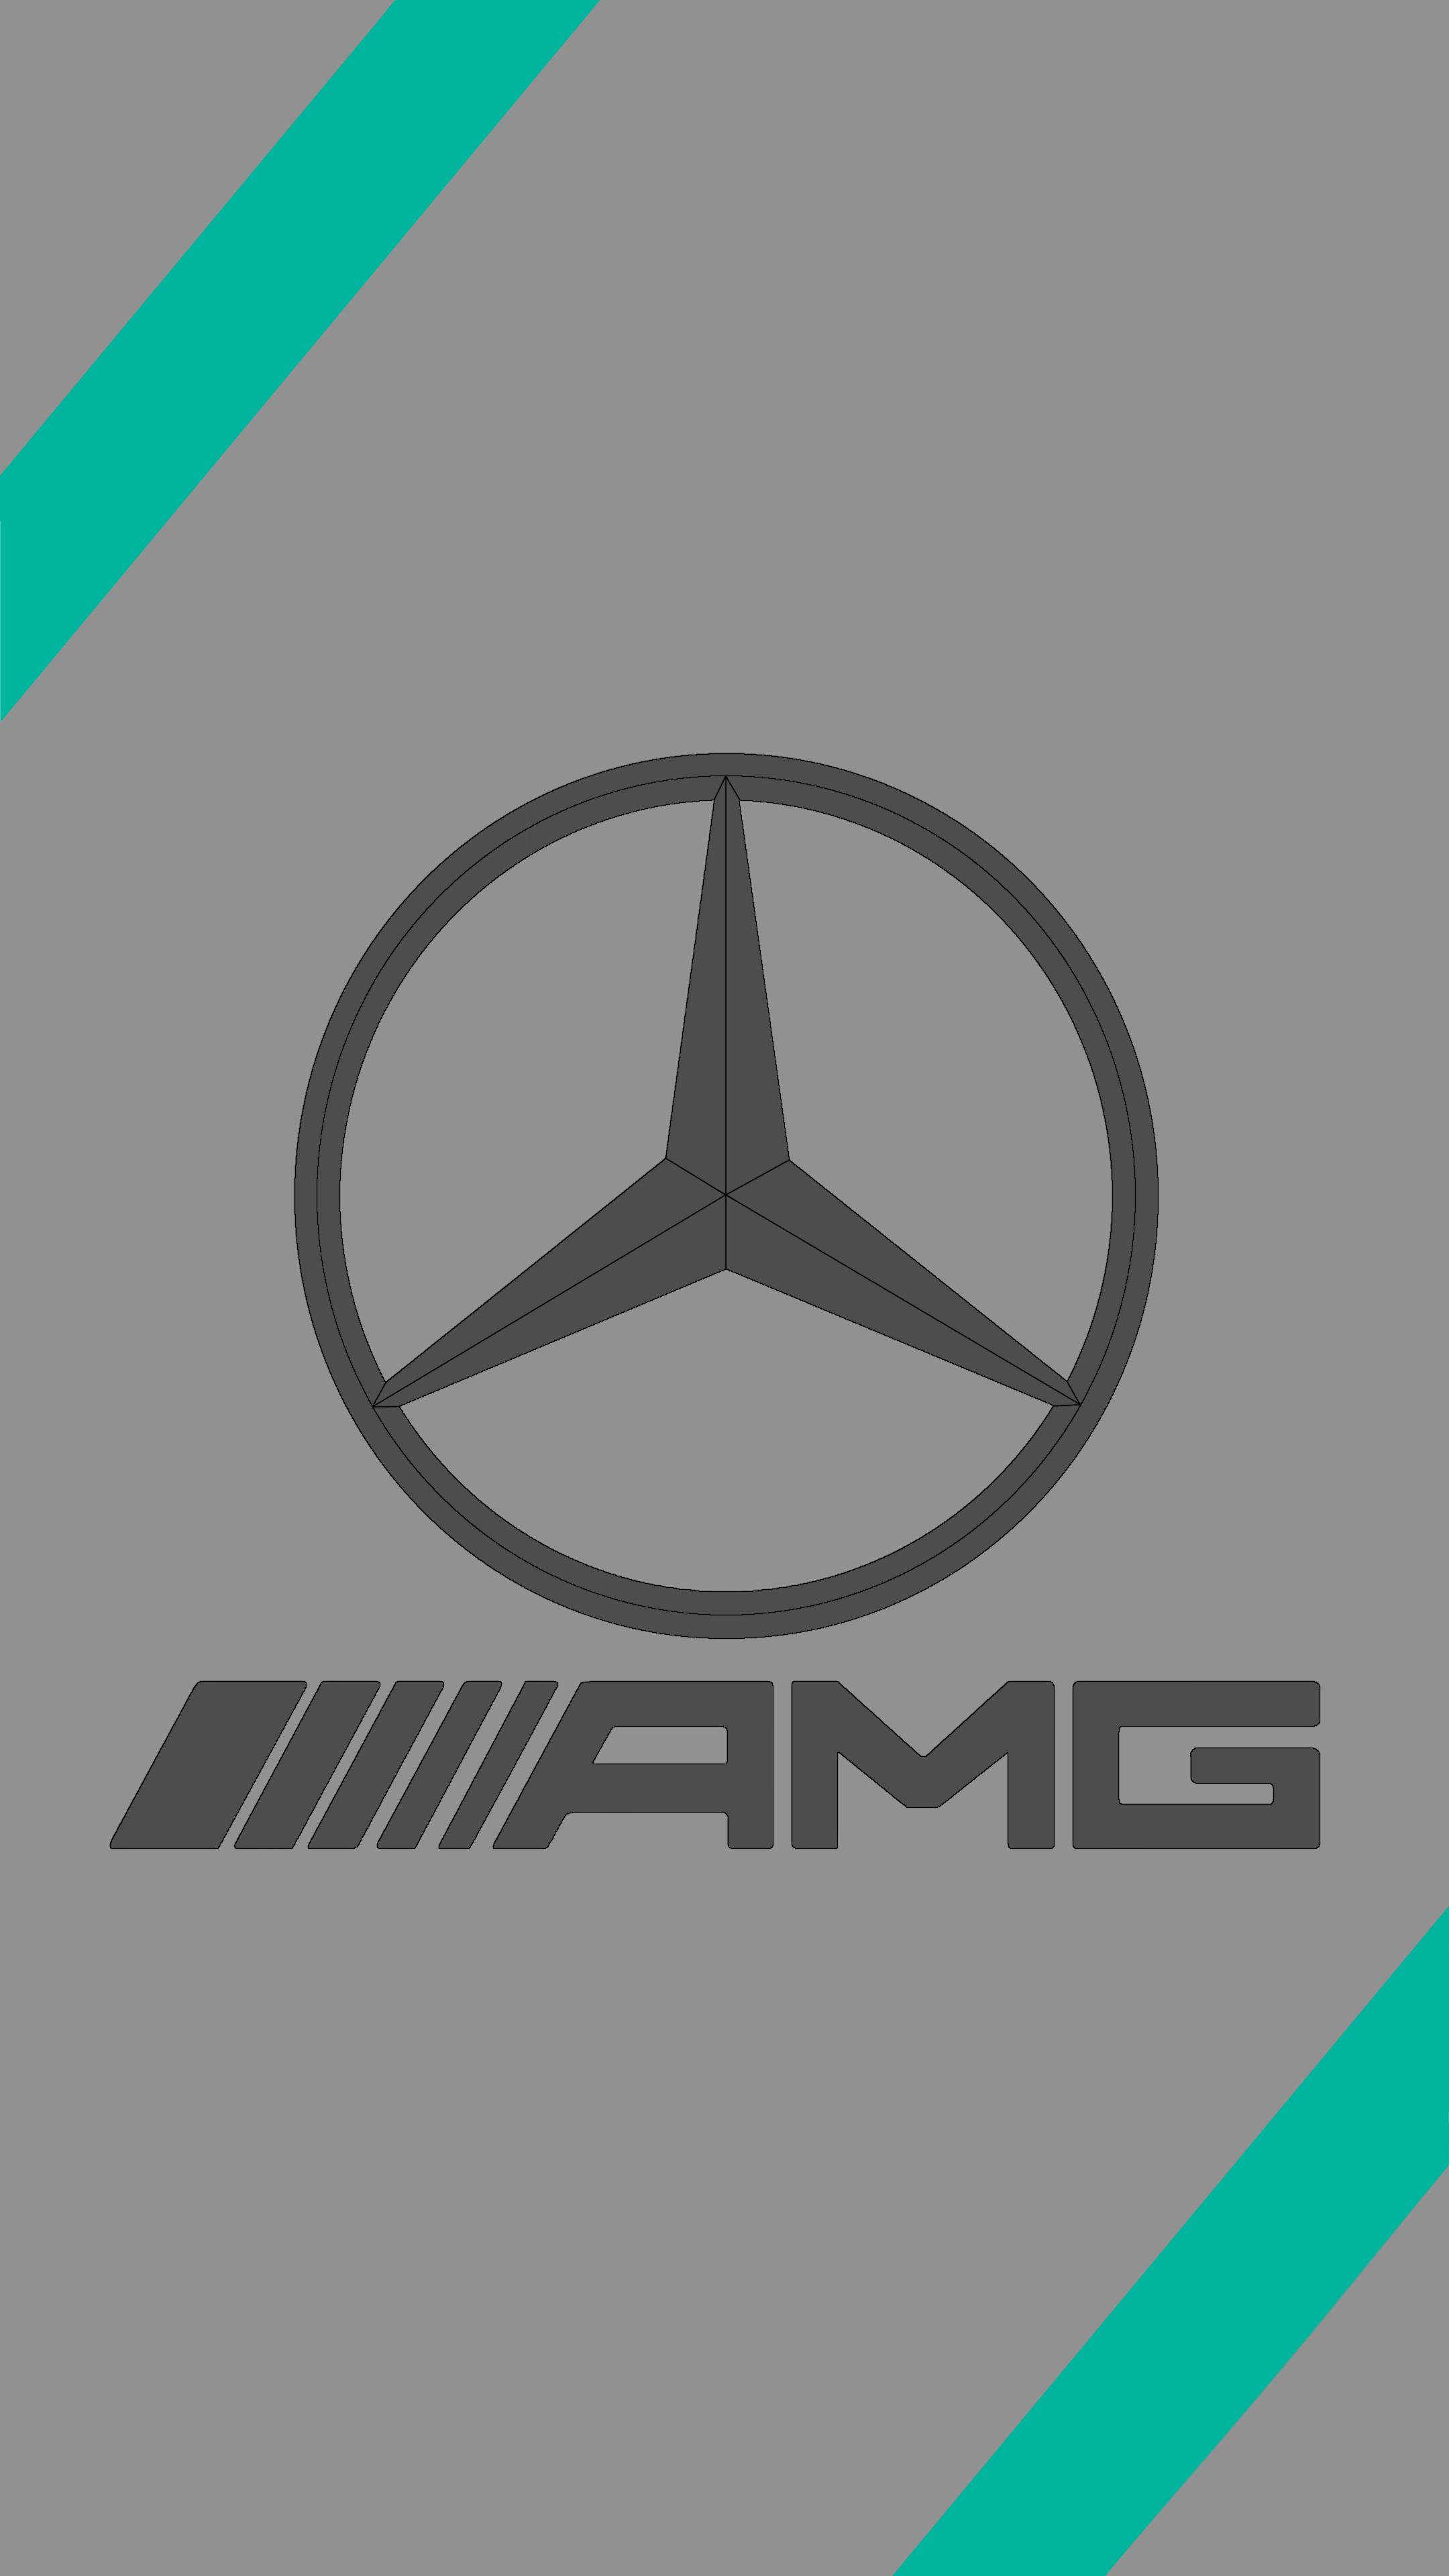 Mercedes Amg Logo Wallpapers Wallpaper Cave